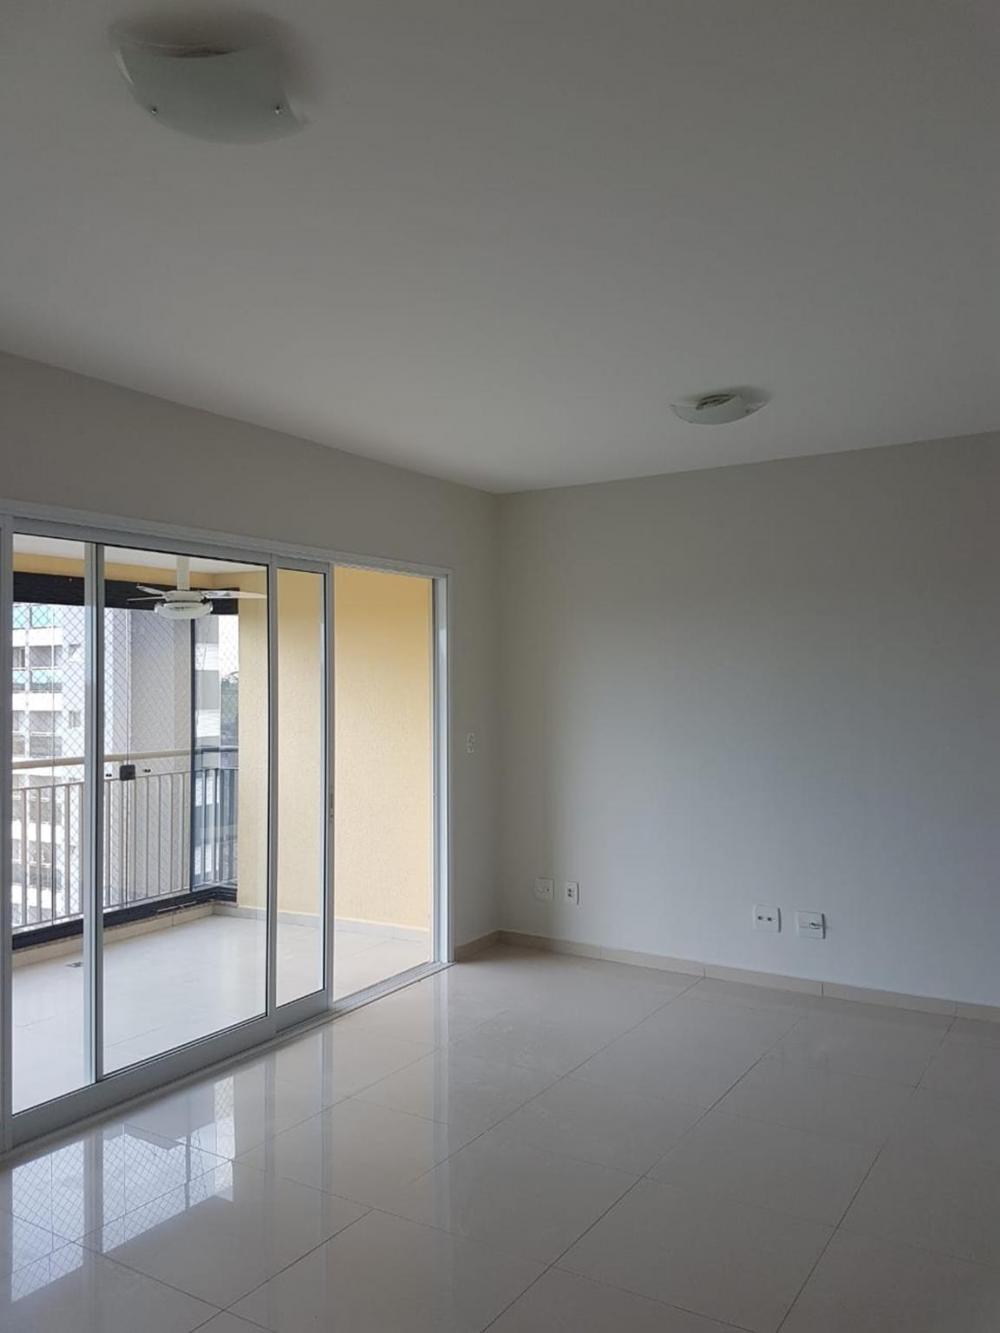 SAO JOSE DO RIO PRETO Apartamento Venda R$680.000,00 3 Dormitorios 1 Suite Area construida 124.00m2